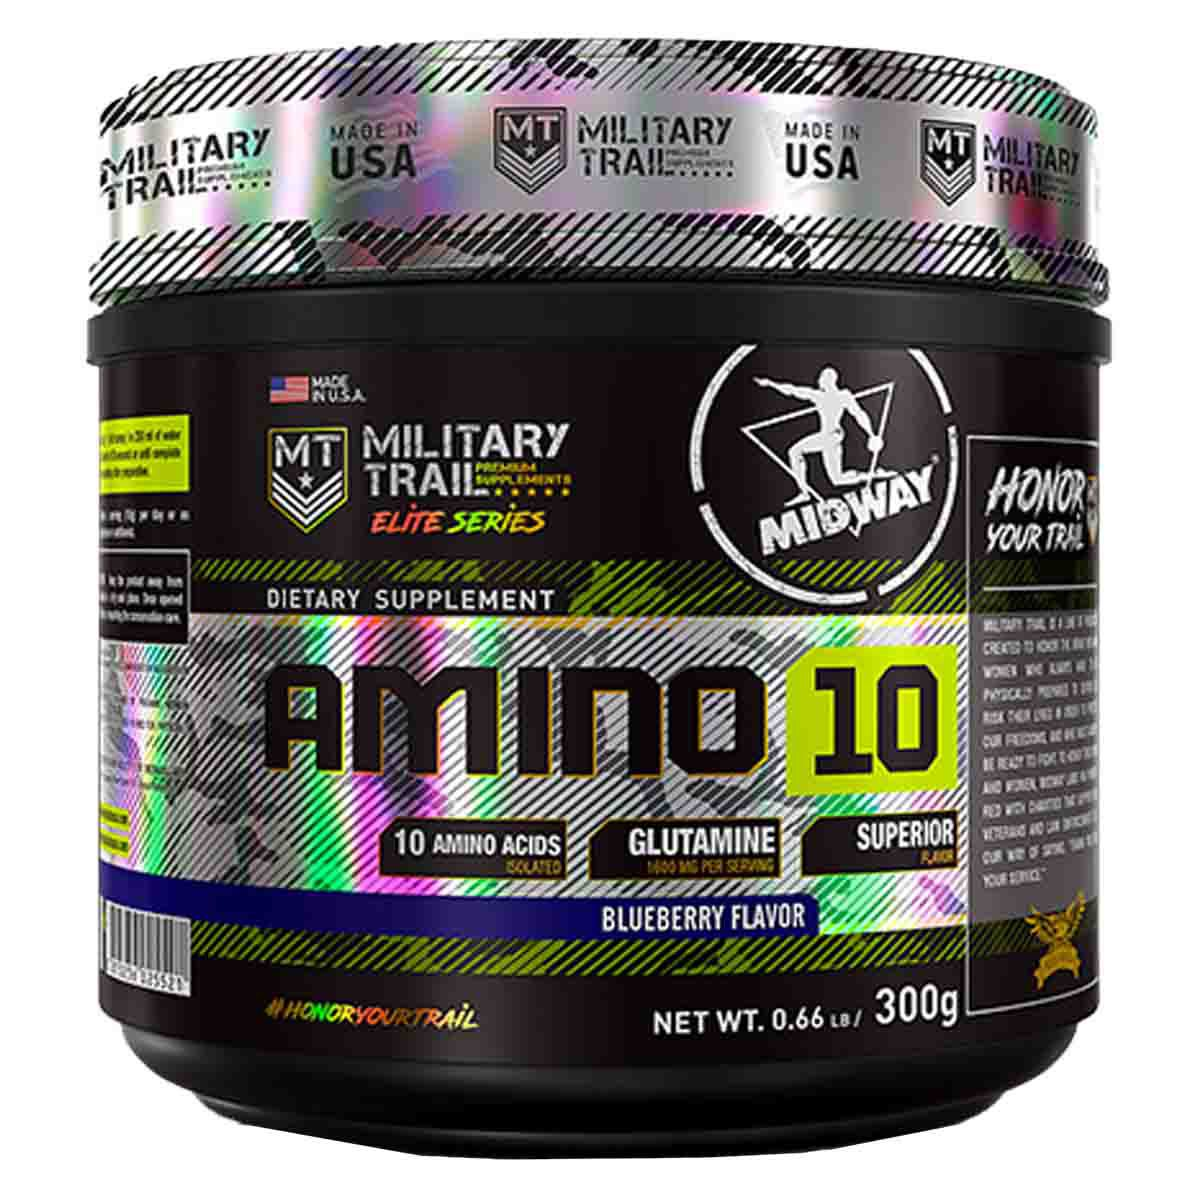 Amino 10 Powder 300g - Midway